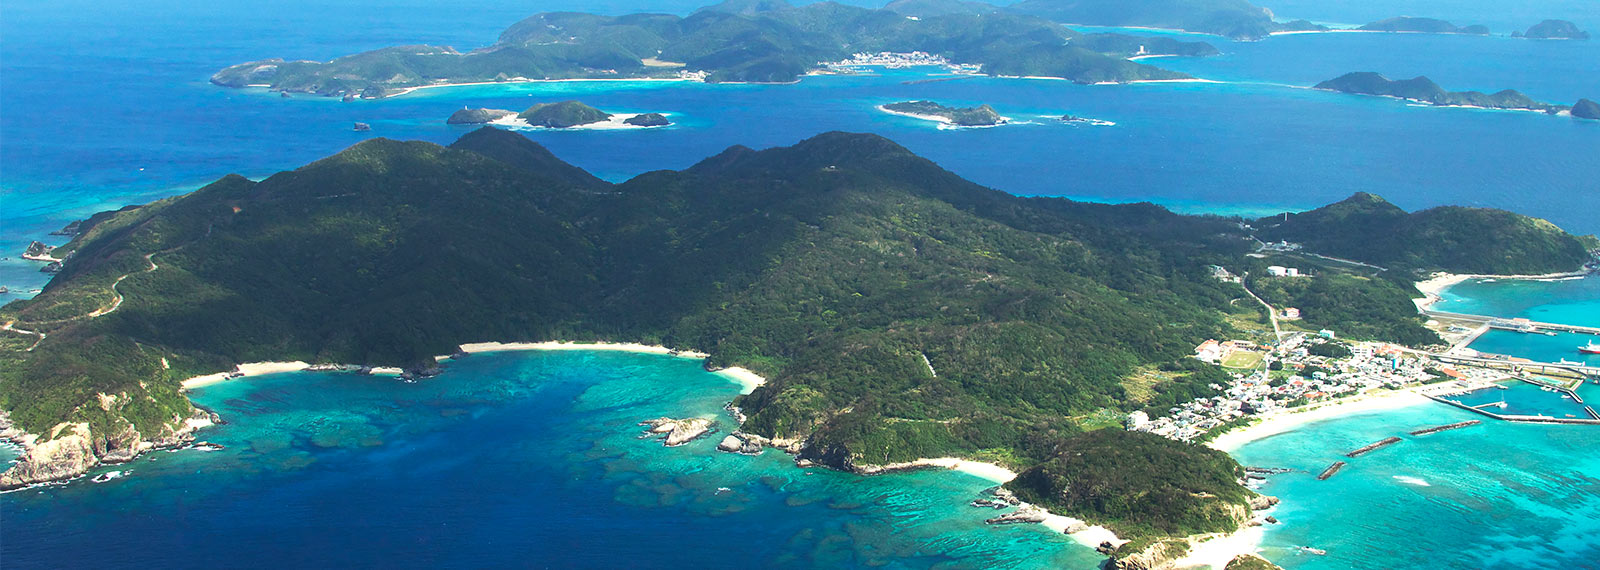 The Island Of Long Life Japan